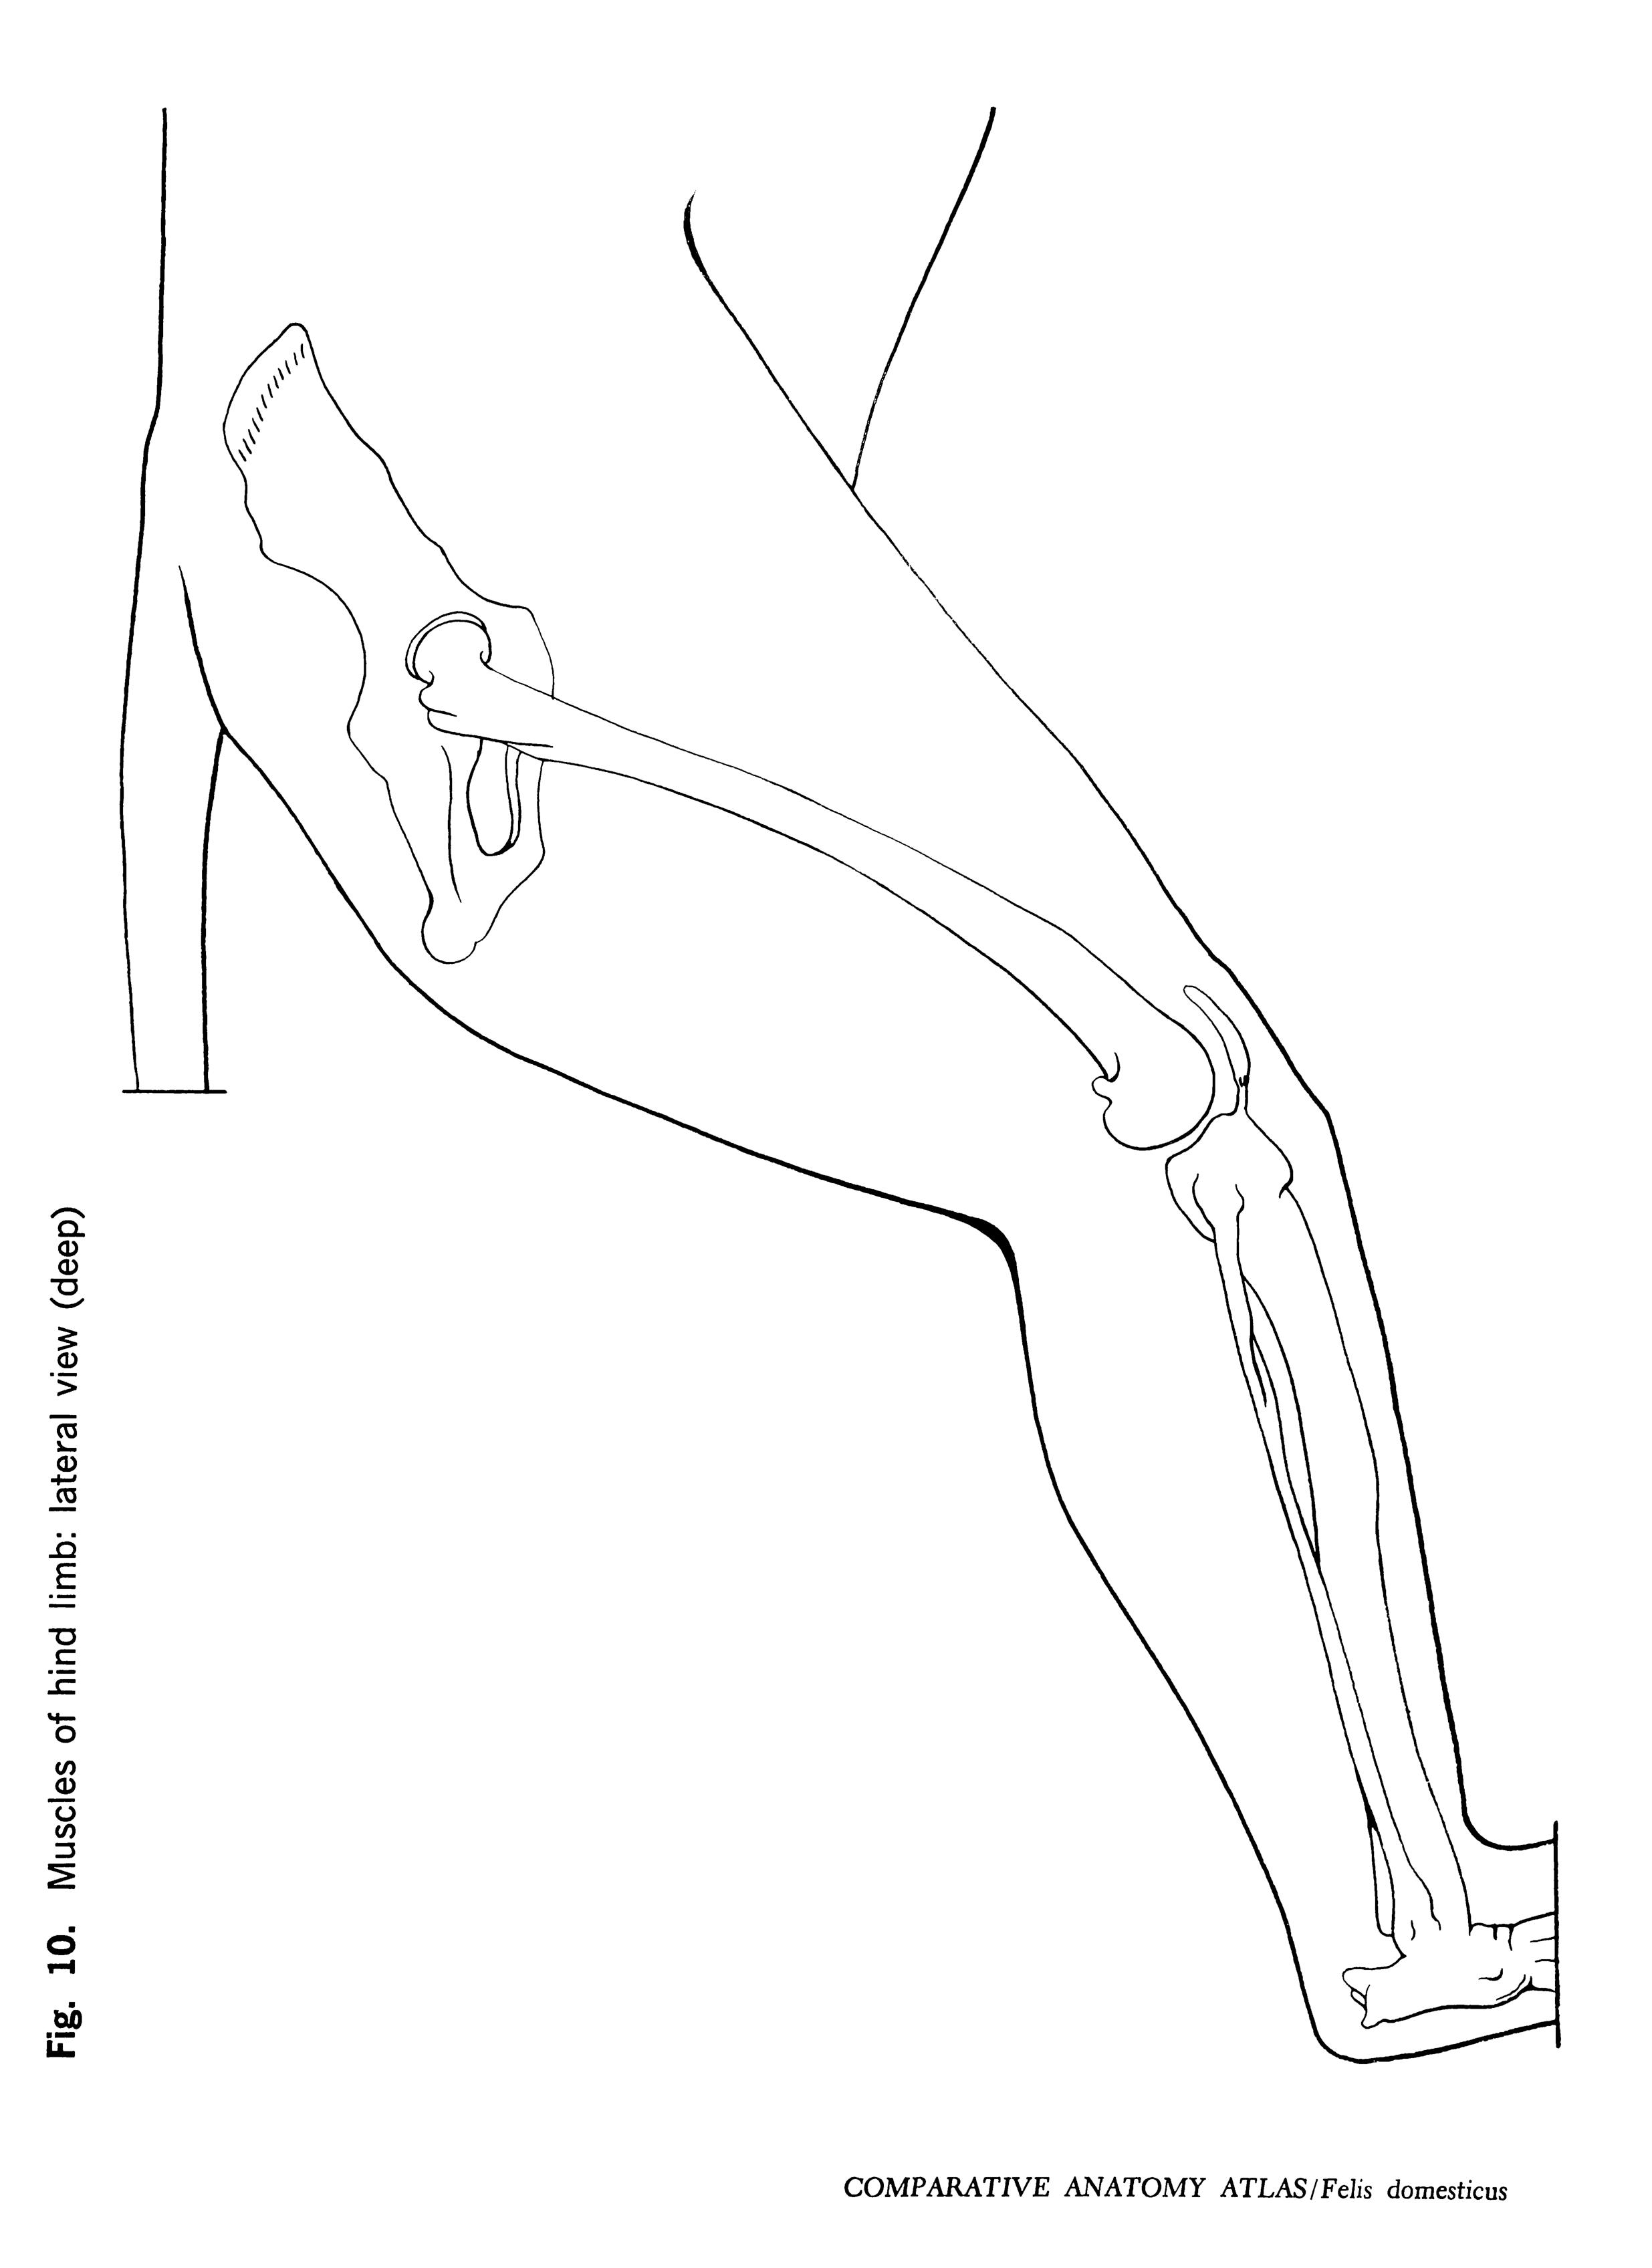 Felis domesticus Figure 10